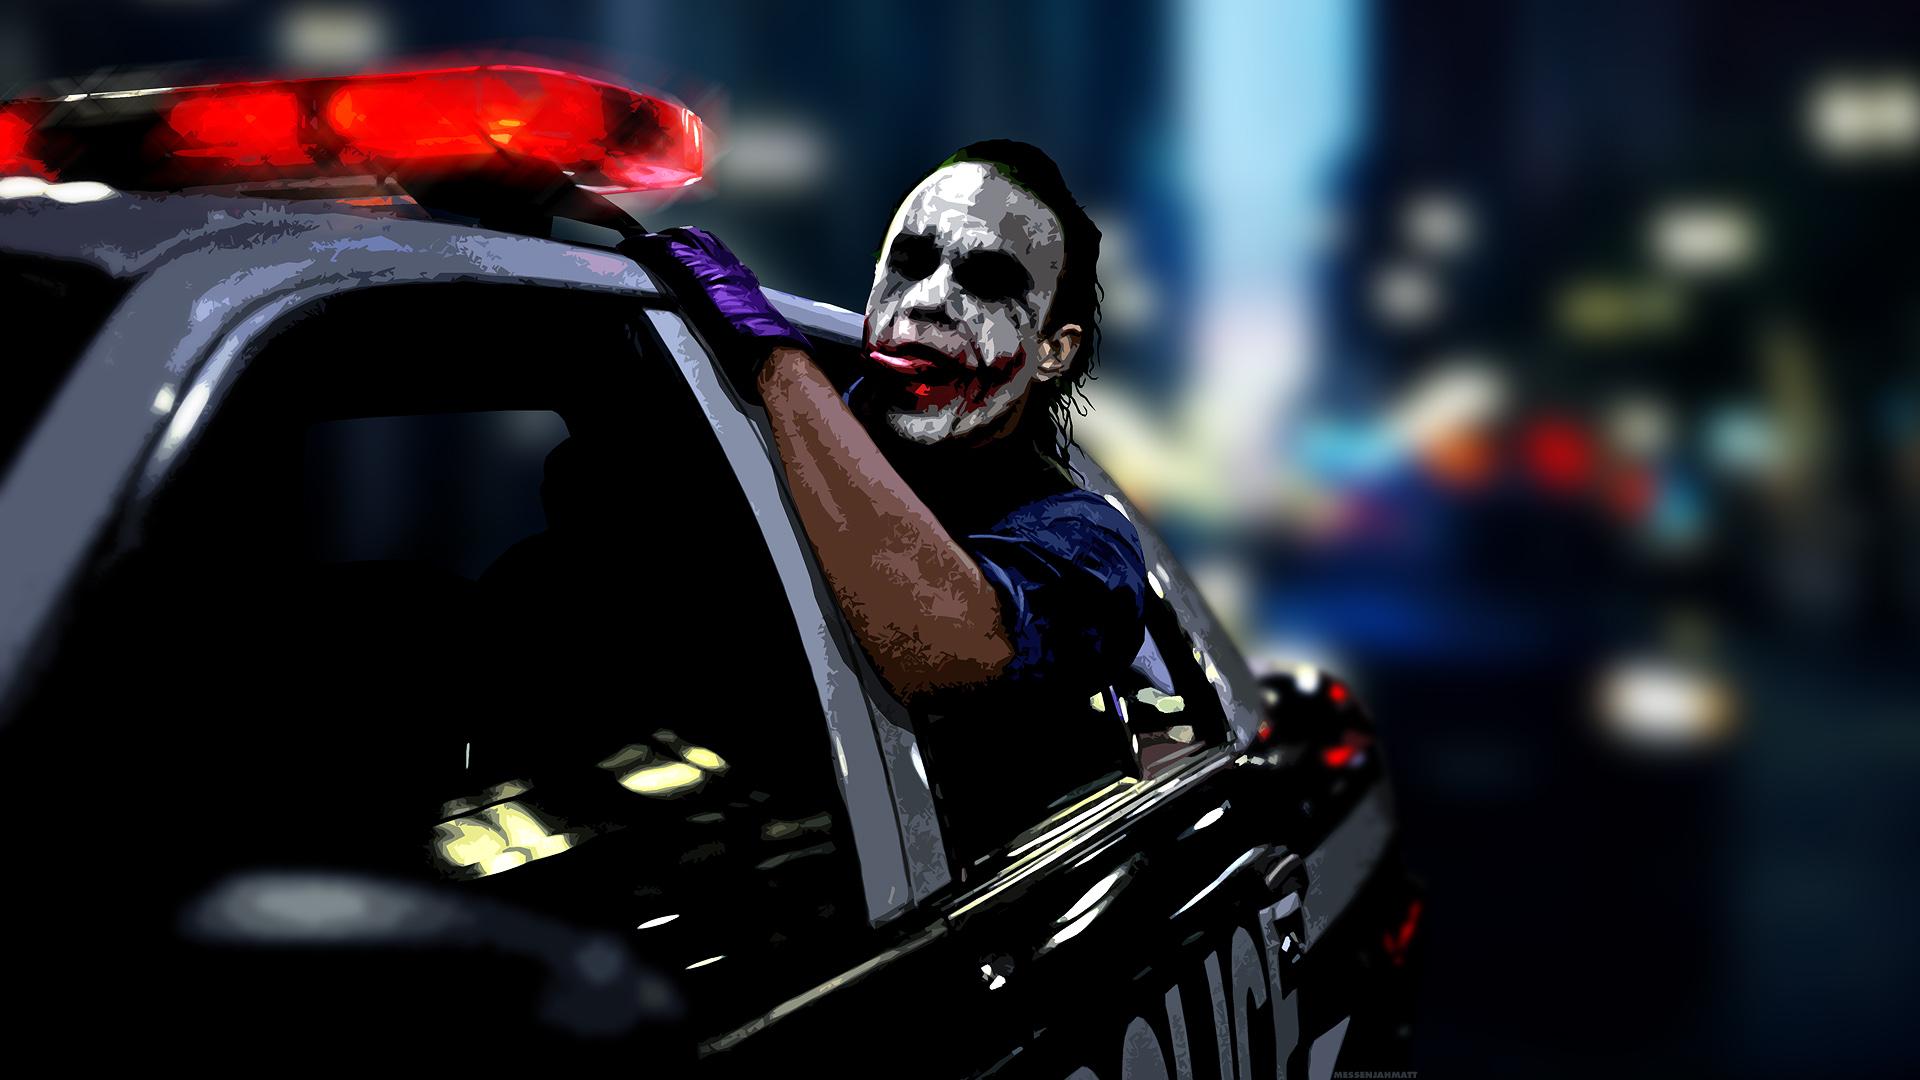 Wallpaper 1920x1080 The Joker Heath Ledger Police Cars Batman 1920x1080